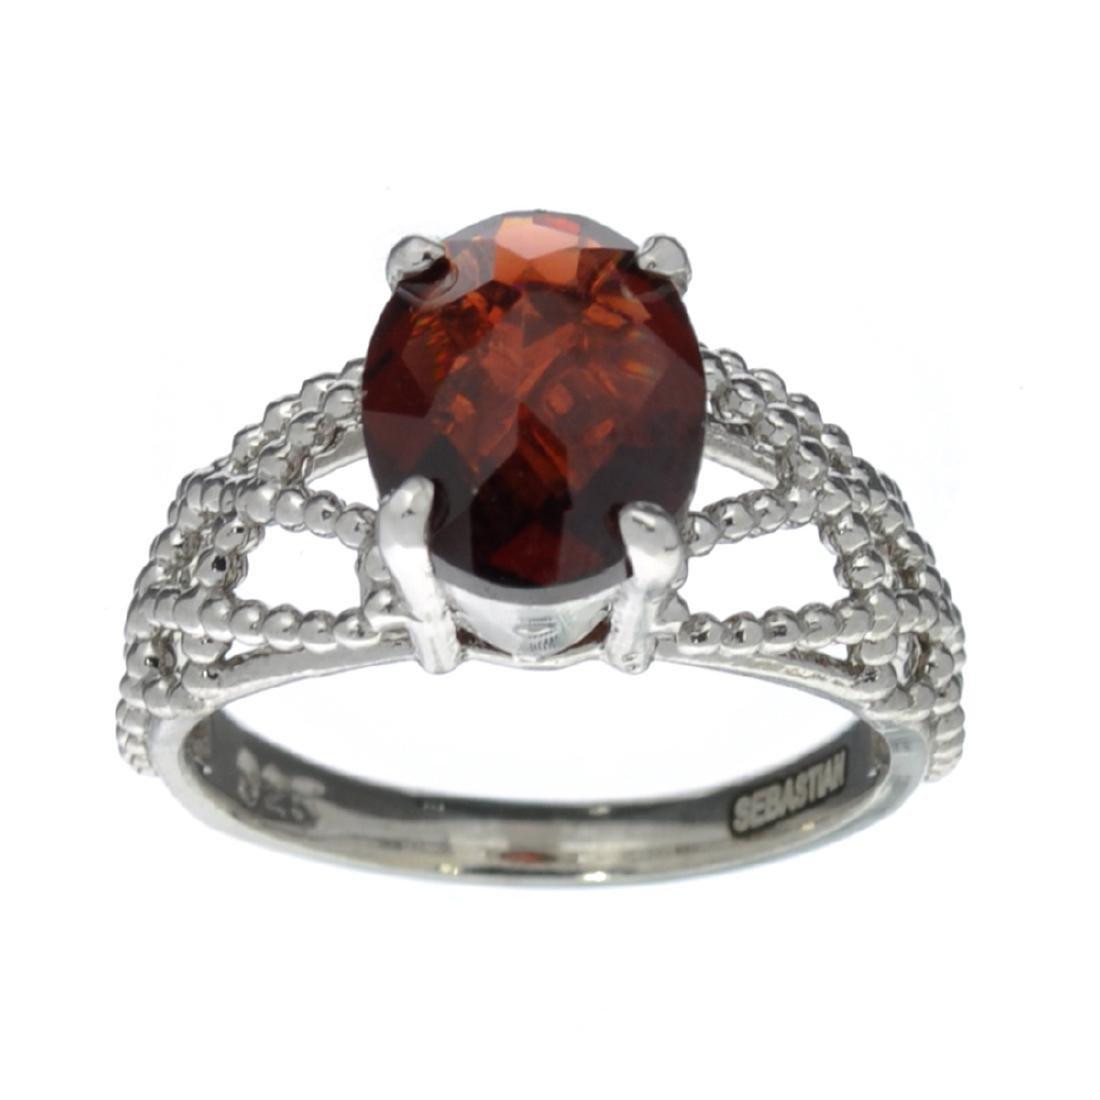 APP: 0.5k Fine Jewelry Designer Sebastian, 3.15CT Oval